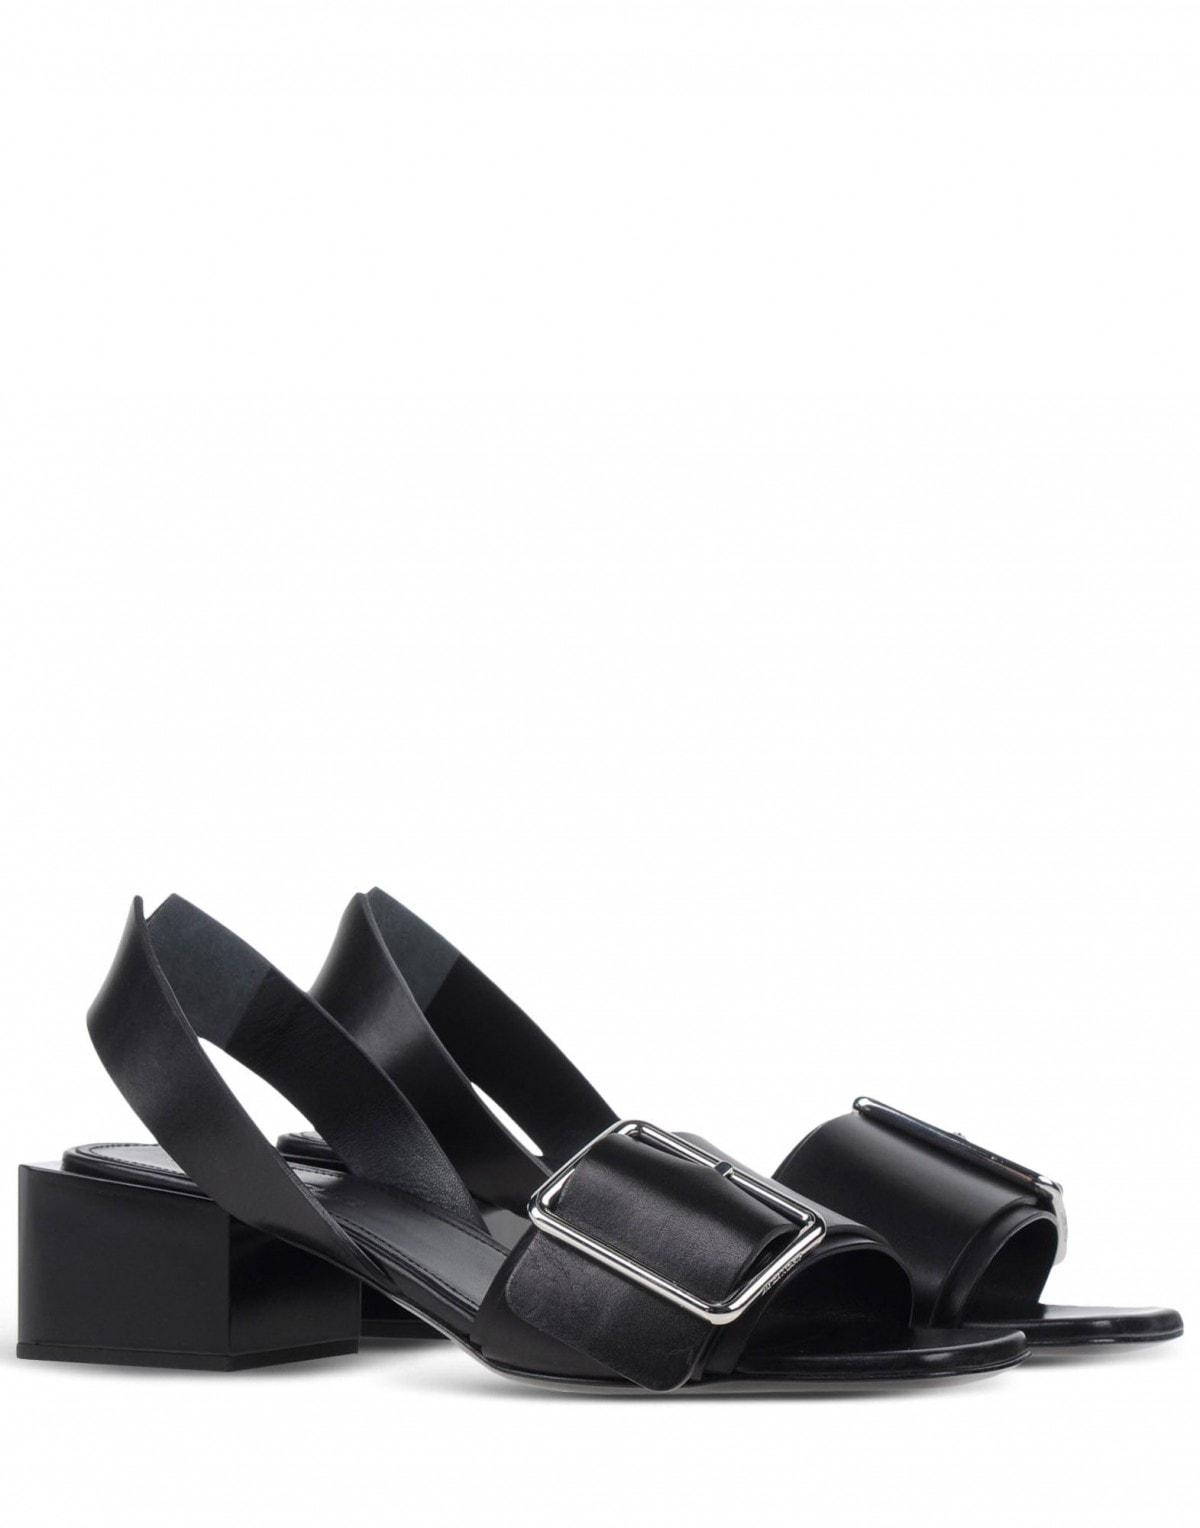 jil sander sandali tacco basso